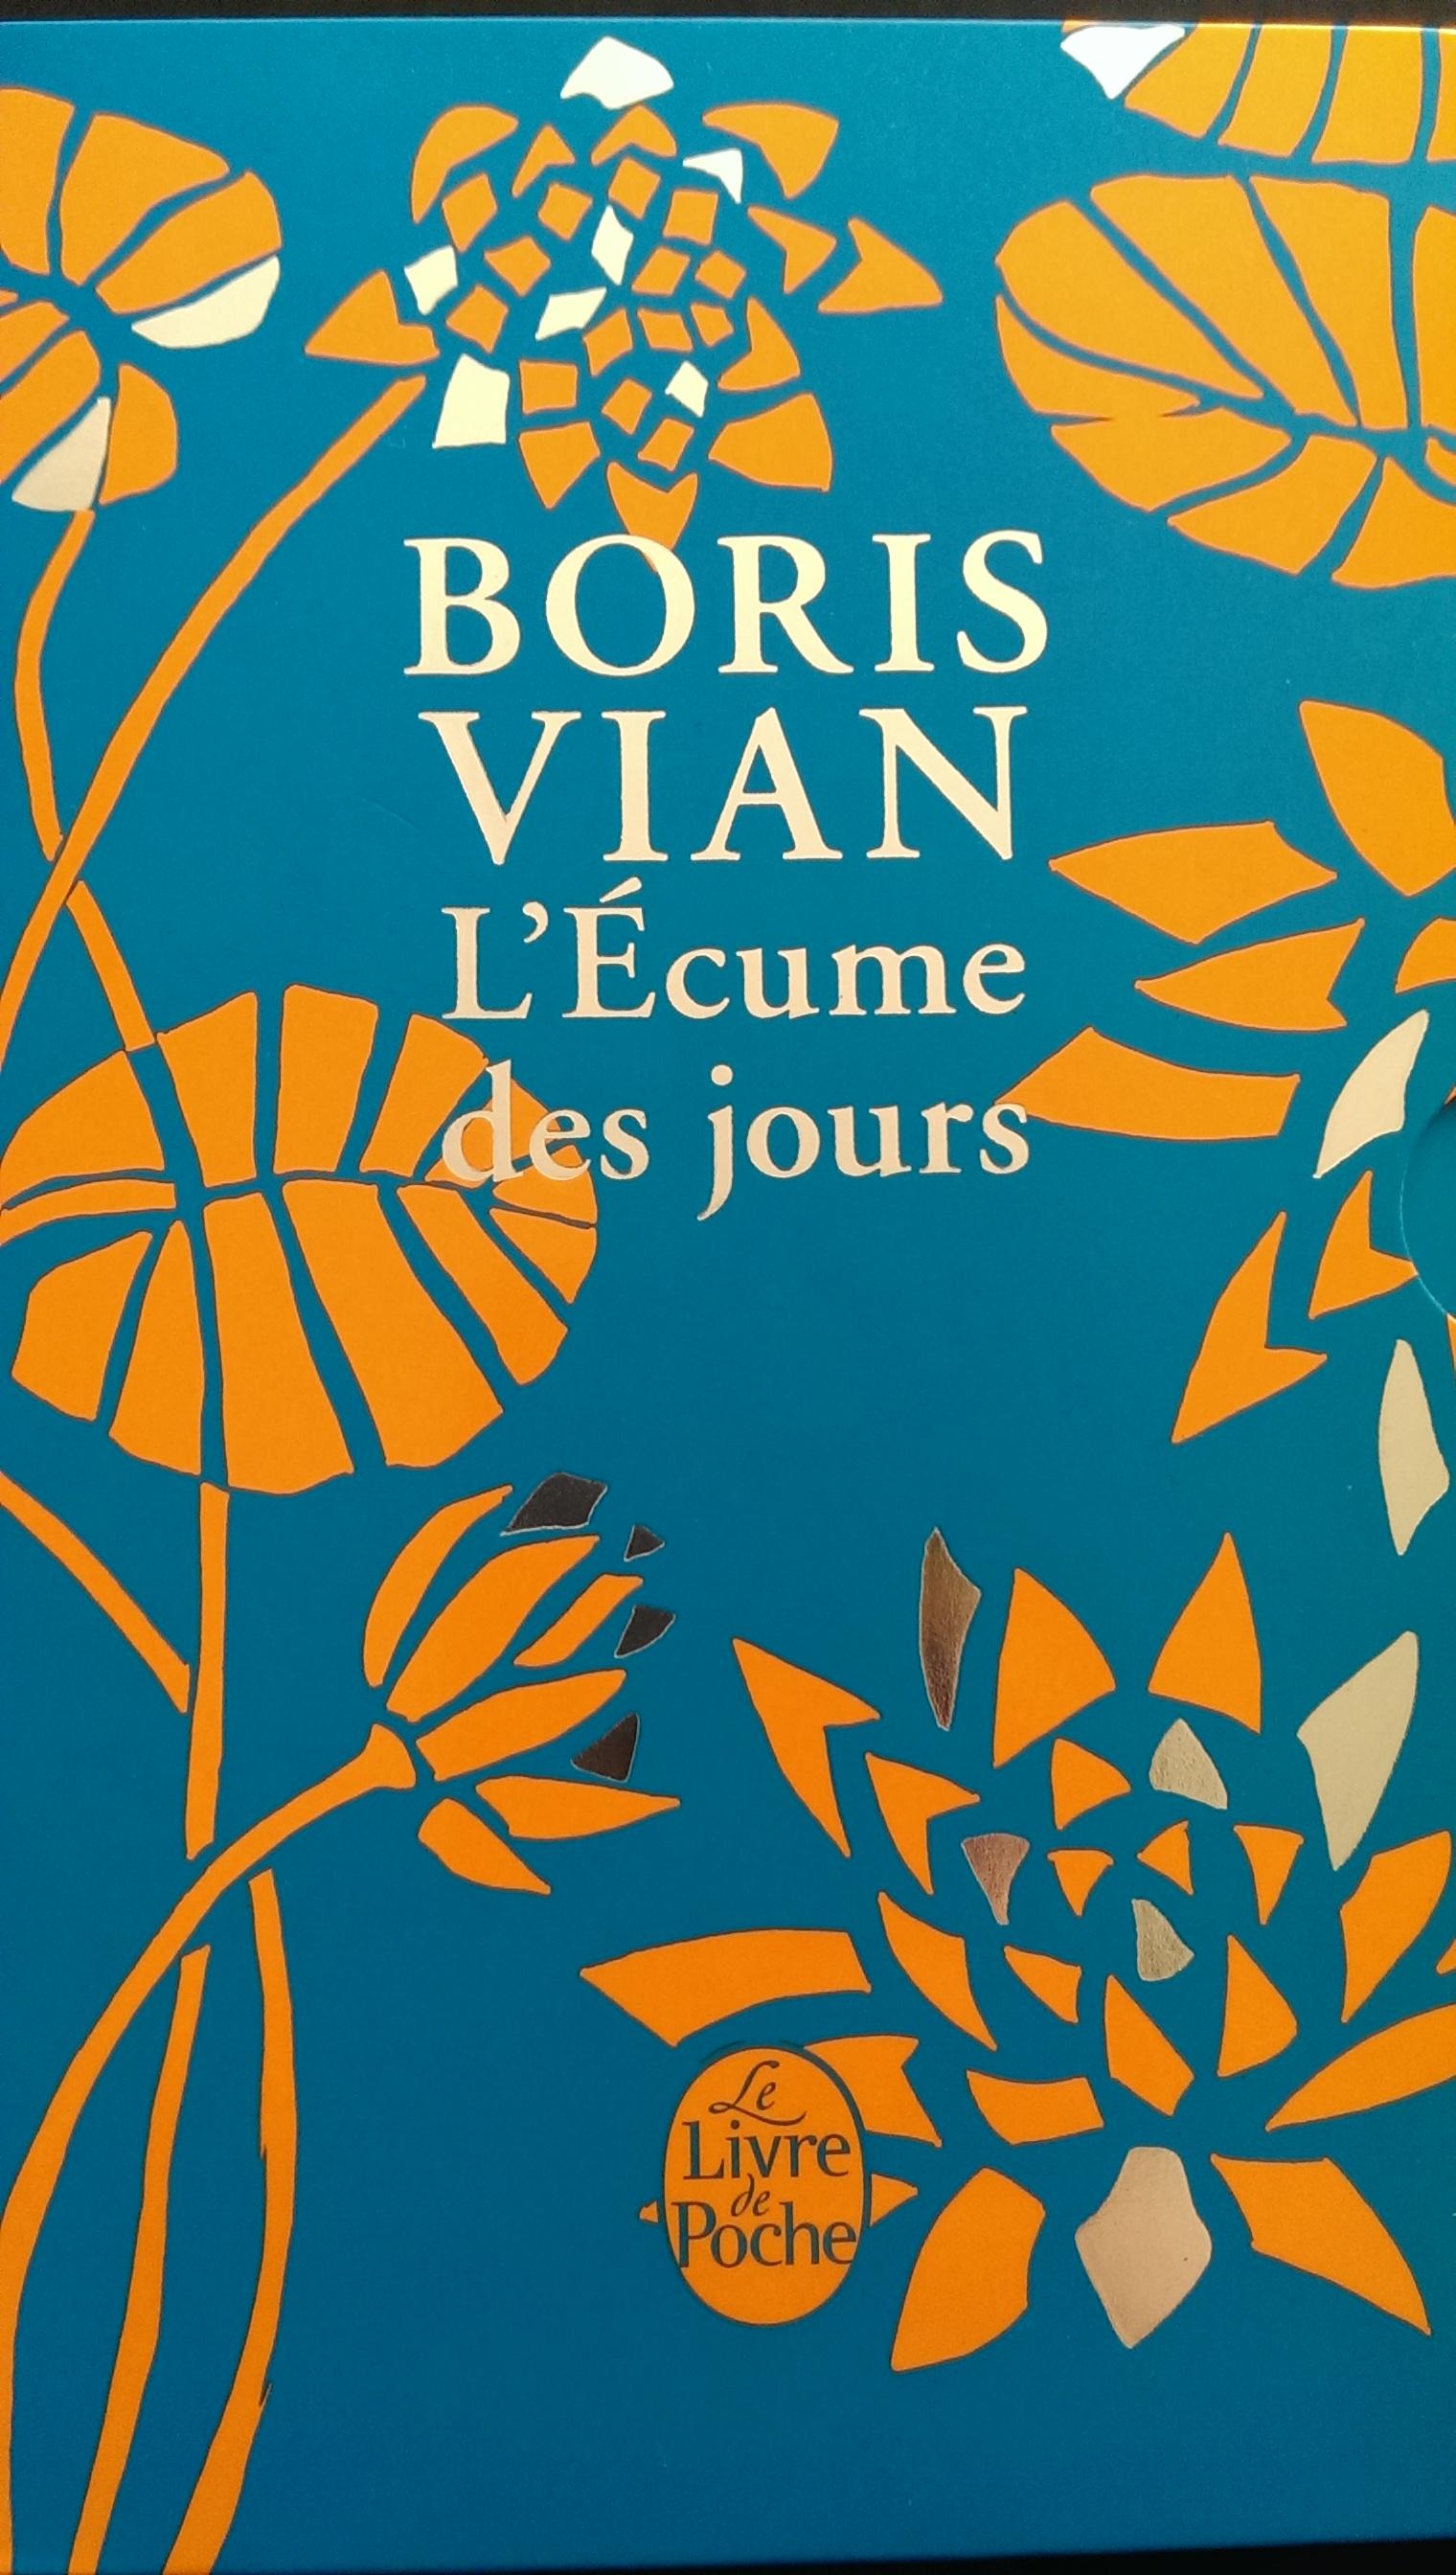 online frances burney a literary life